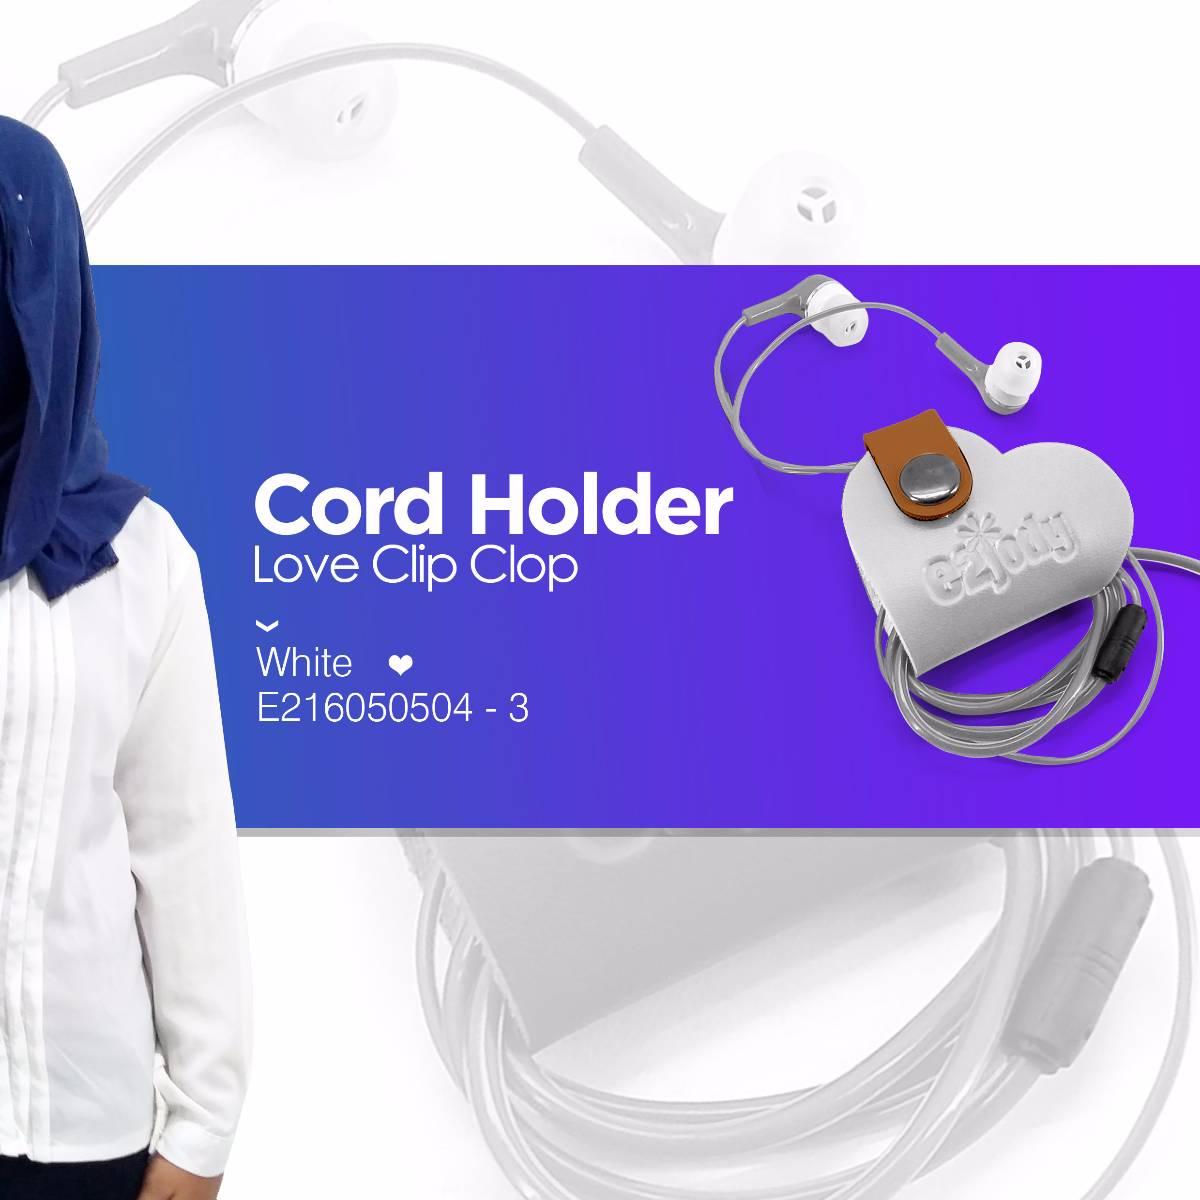 Cord Holder Love3